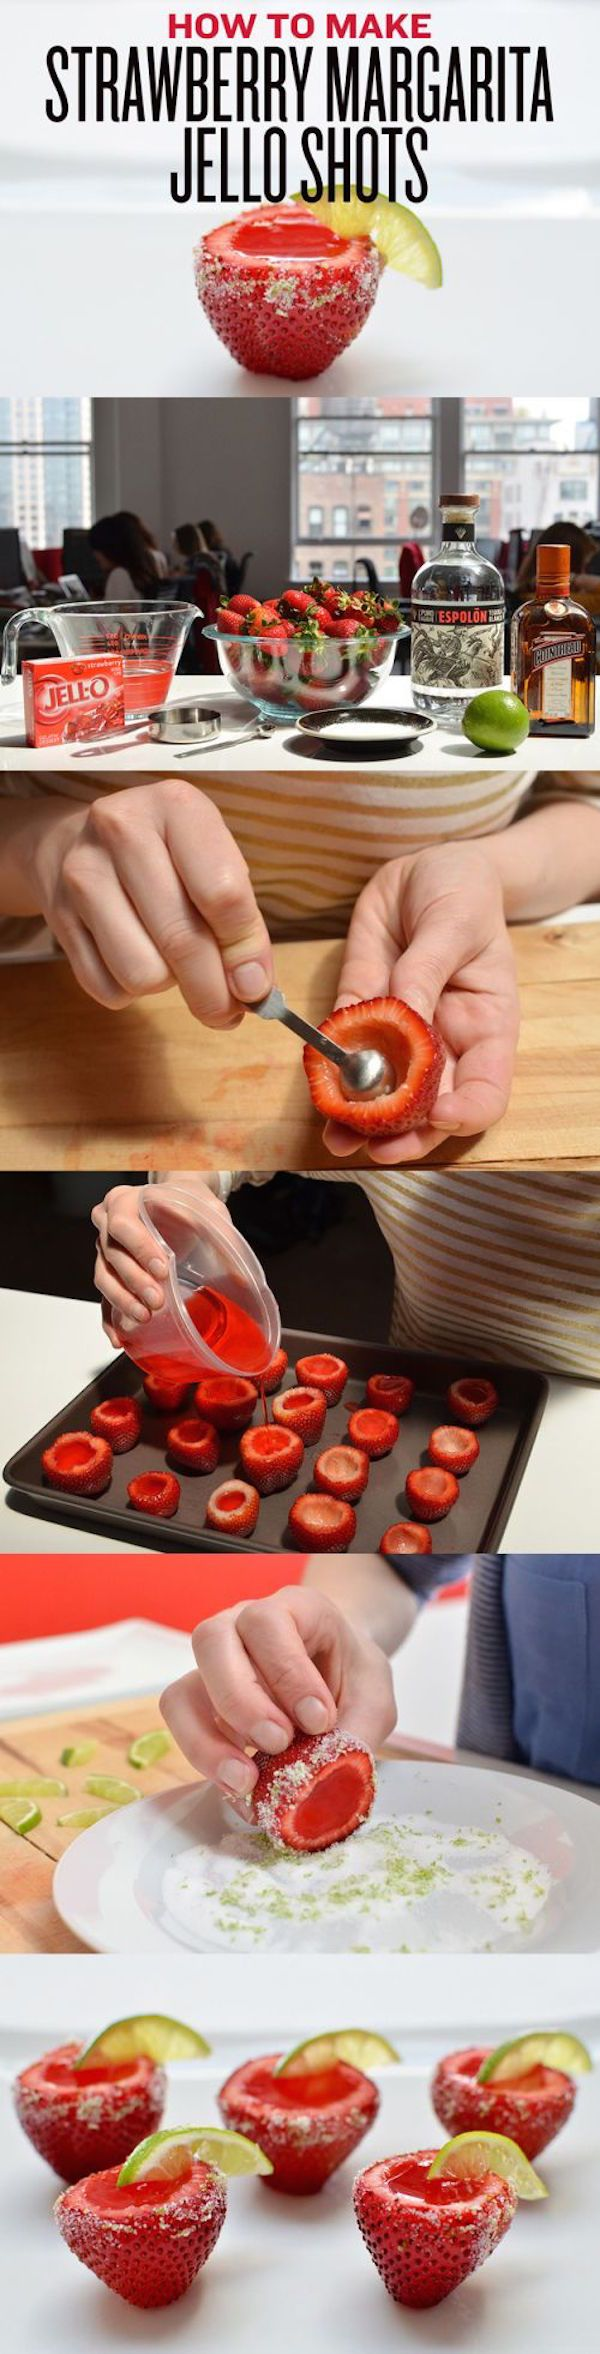 16 Superslimme lifehacks voor aardbeien. Zo maak je aardbeien nog lekkerder!